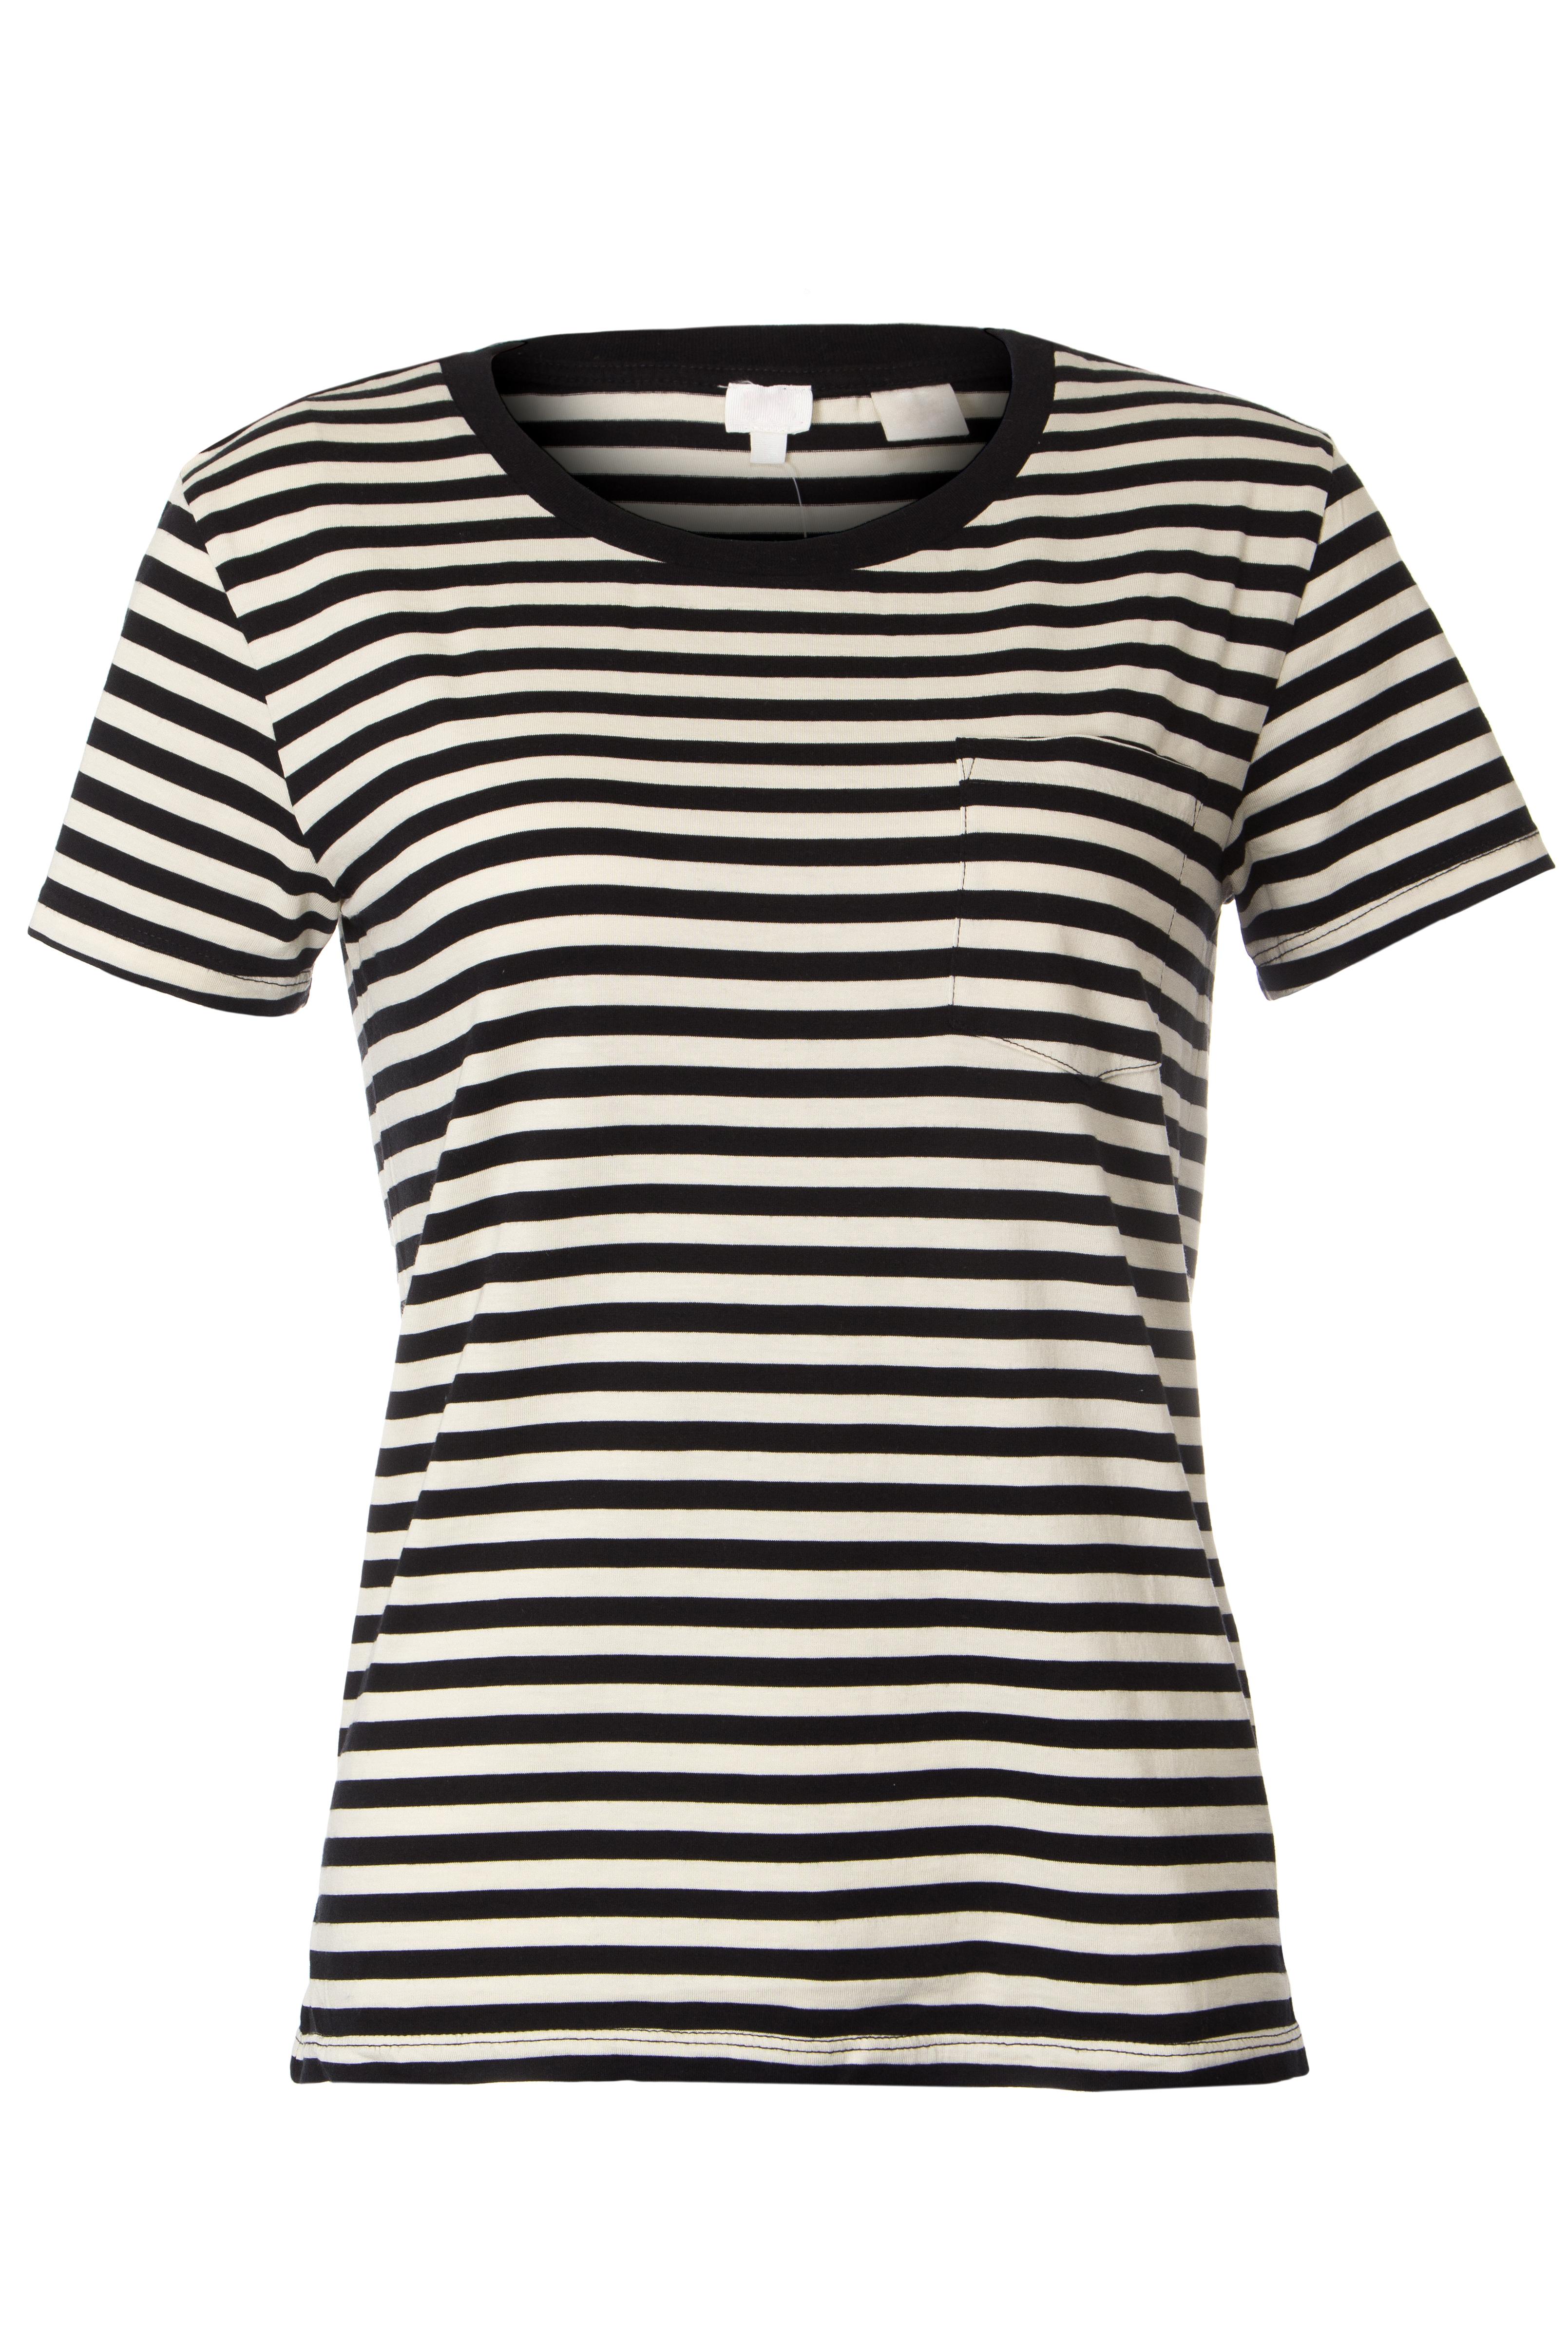 Custom made ladies T-Shirt (3)